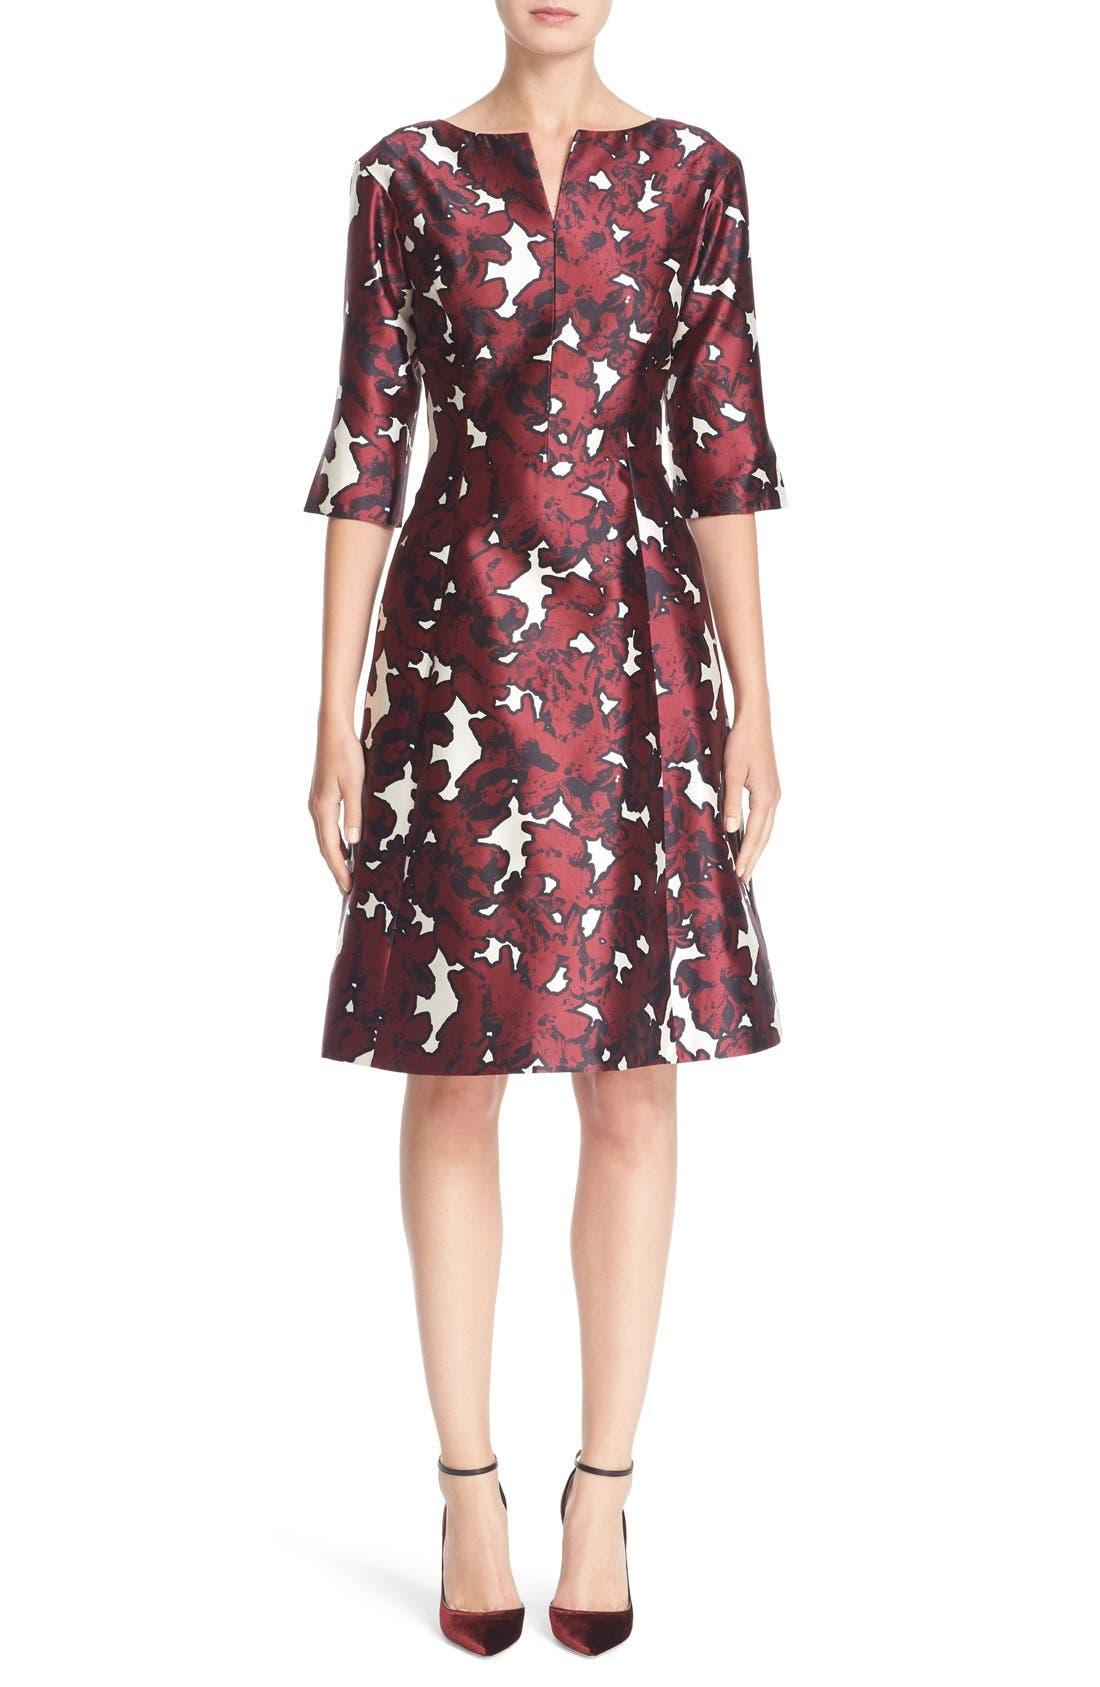 Main Image - Oscar de la Renta 'Pressed Flowers' Print Silk Mikado Dress